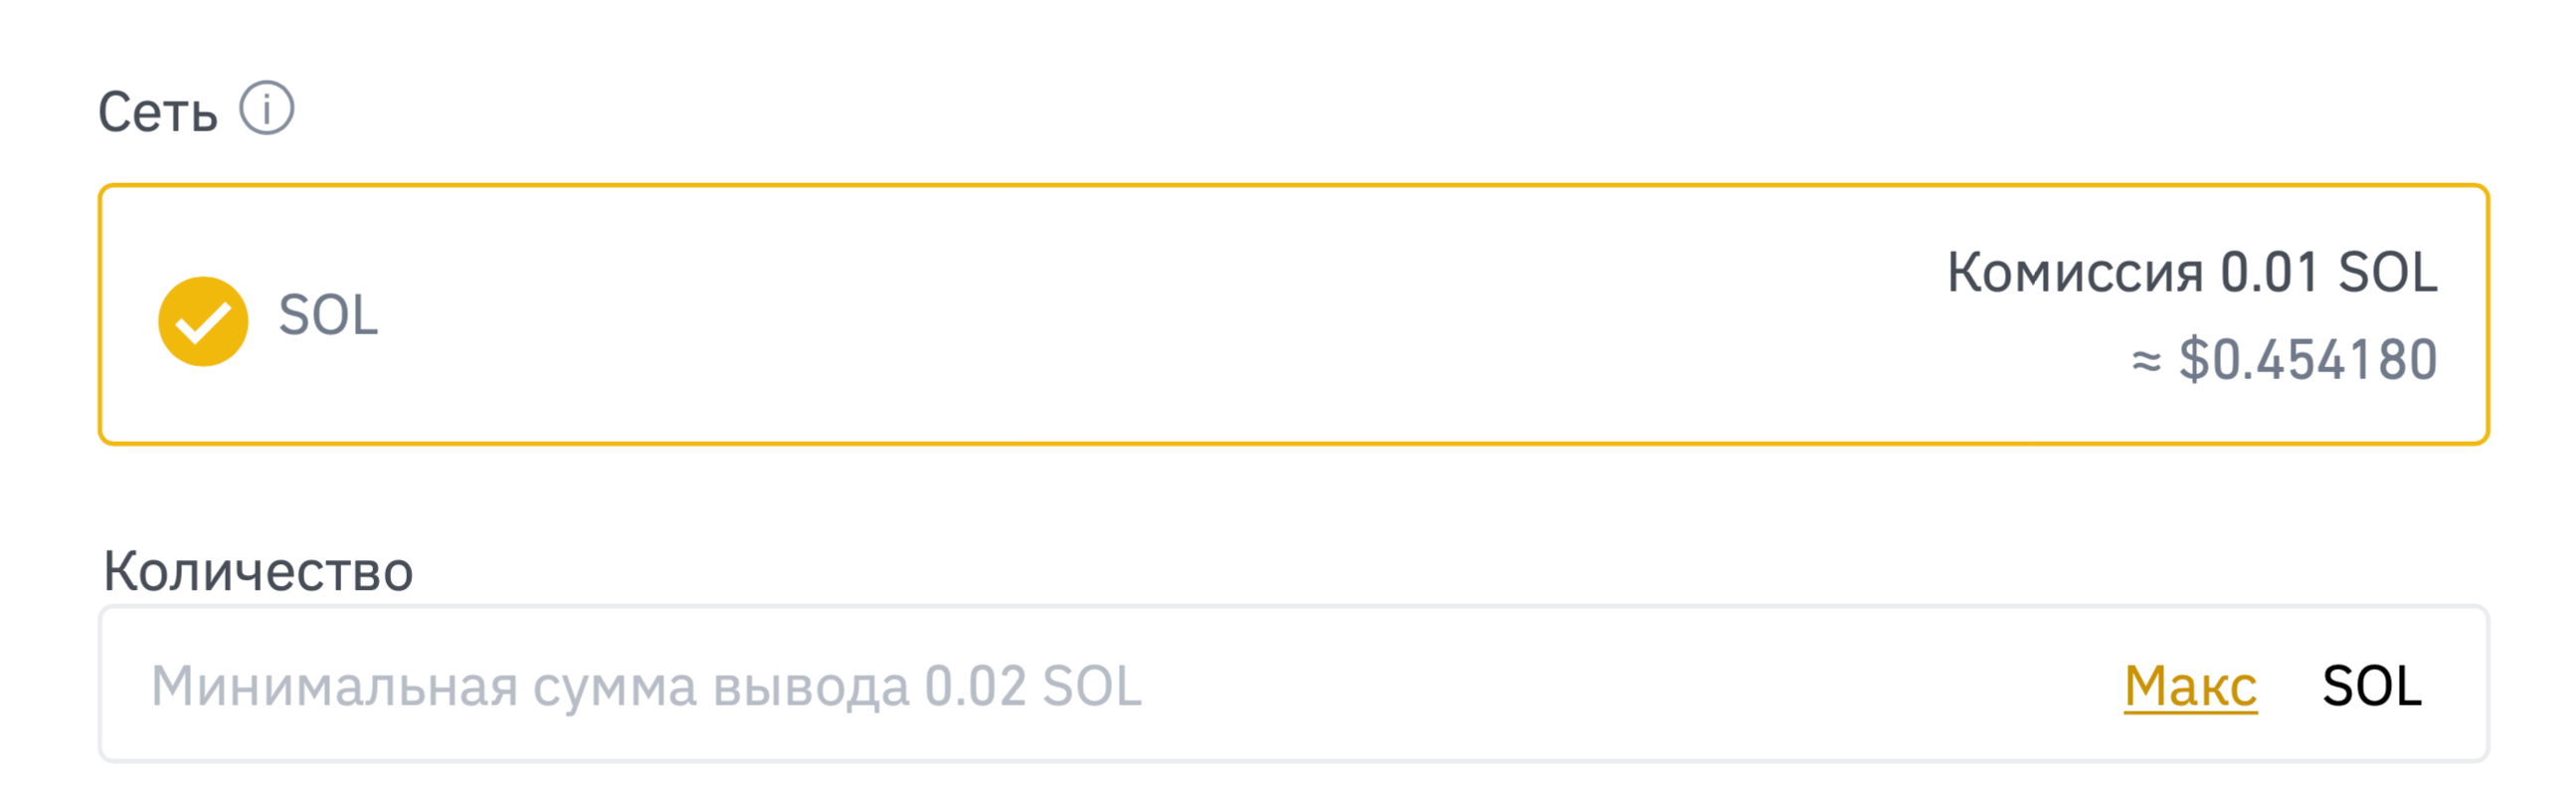 solana sol вывод бинанс комиссия